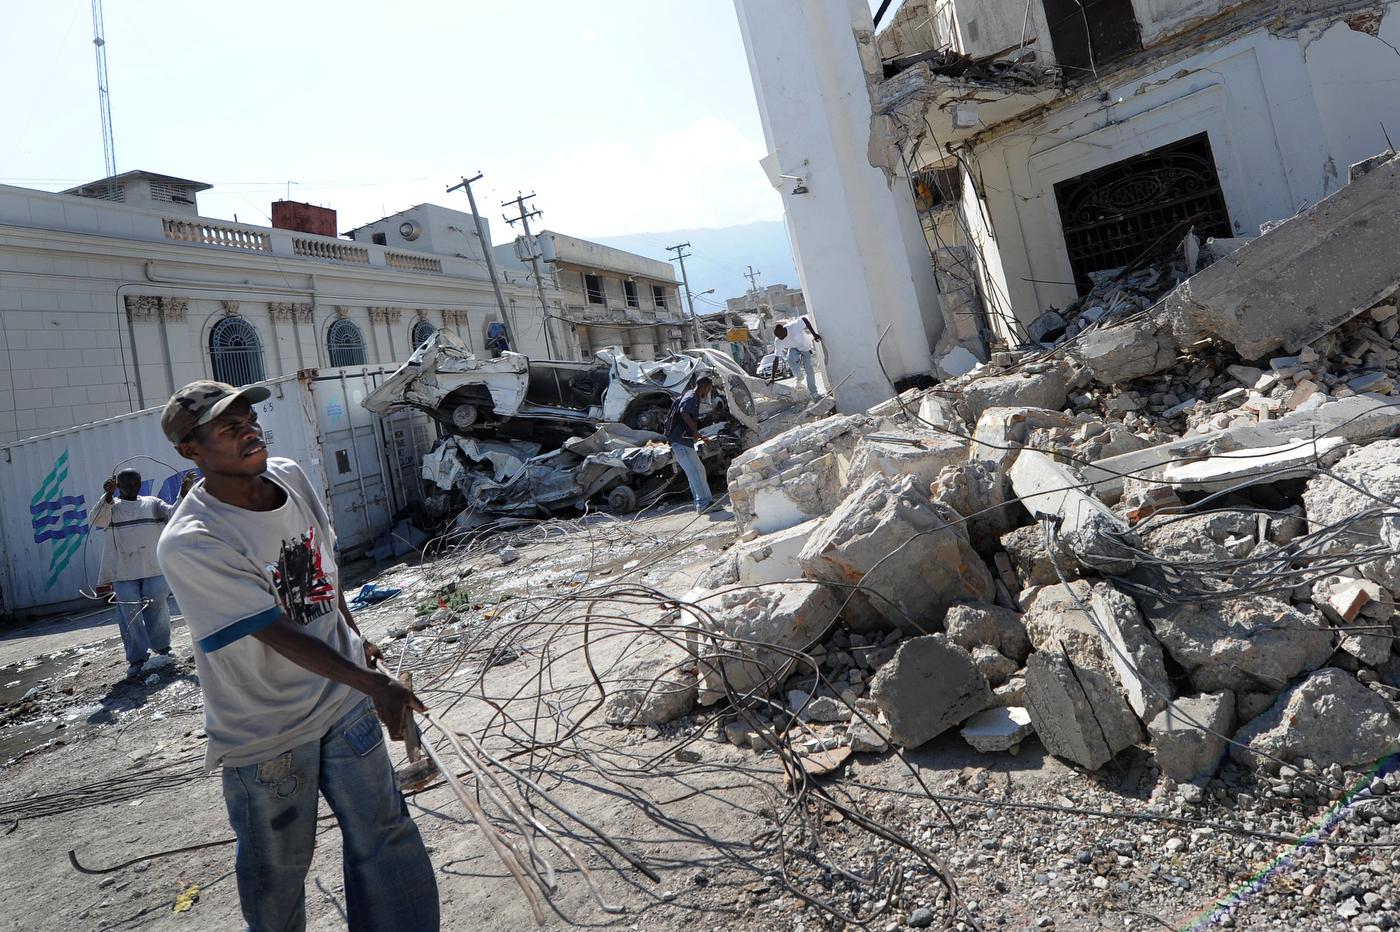 Port au prince wikipedia autos post - Www radio lumiere port au prince haiti ...